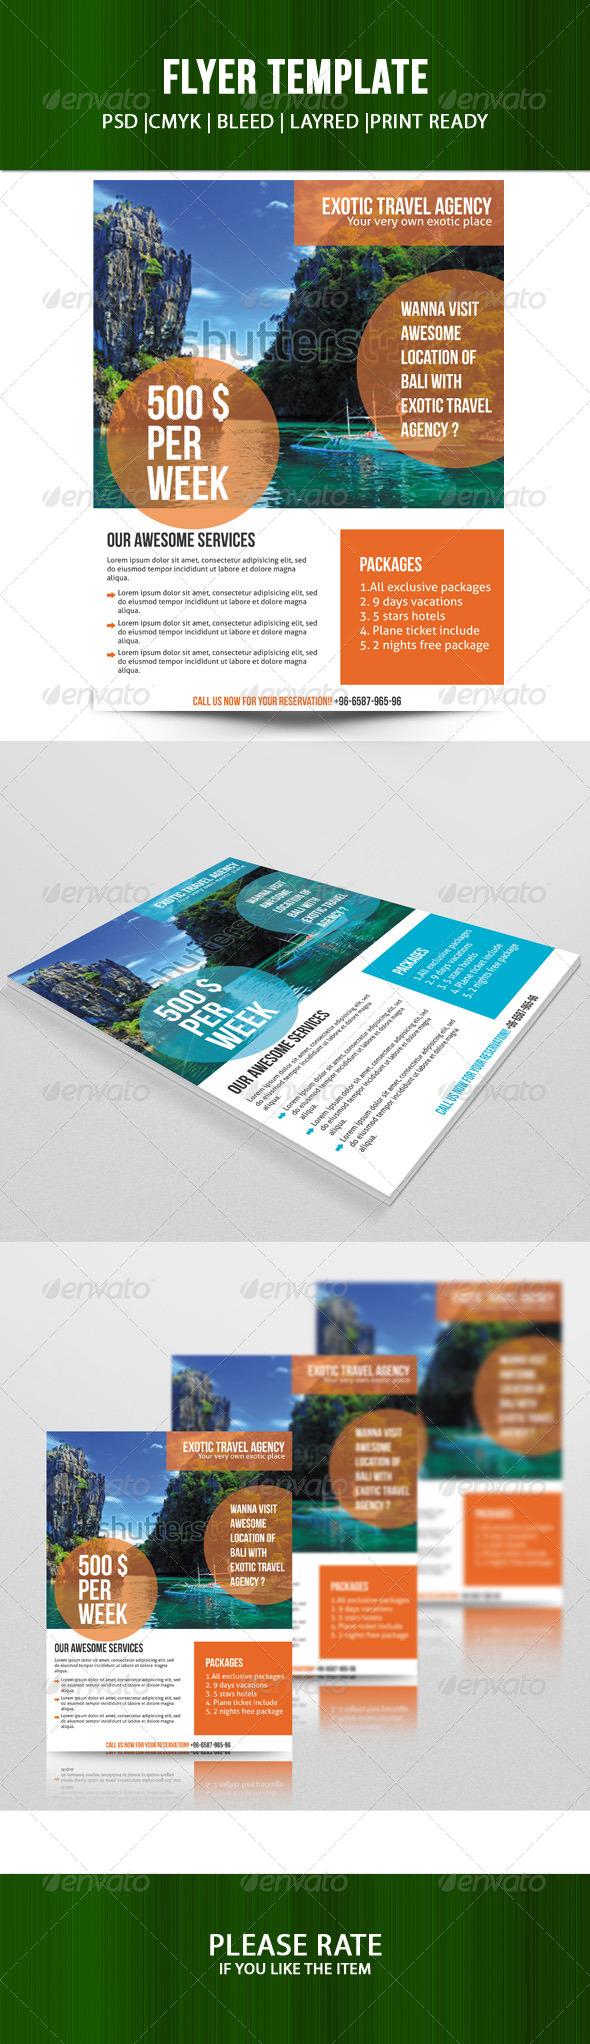 Travel Agency Flyer